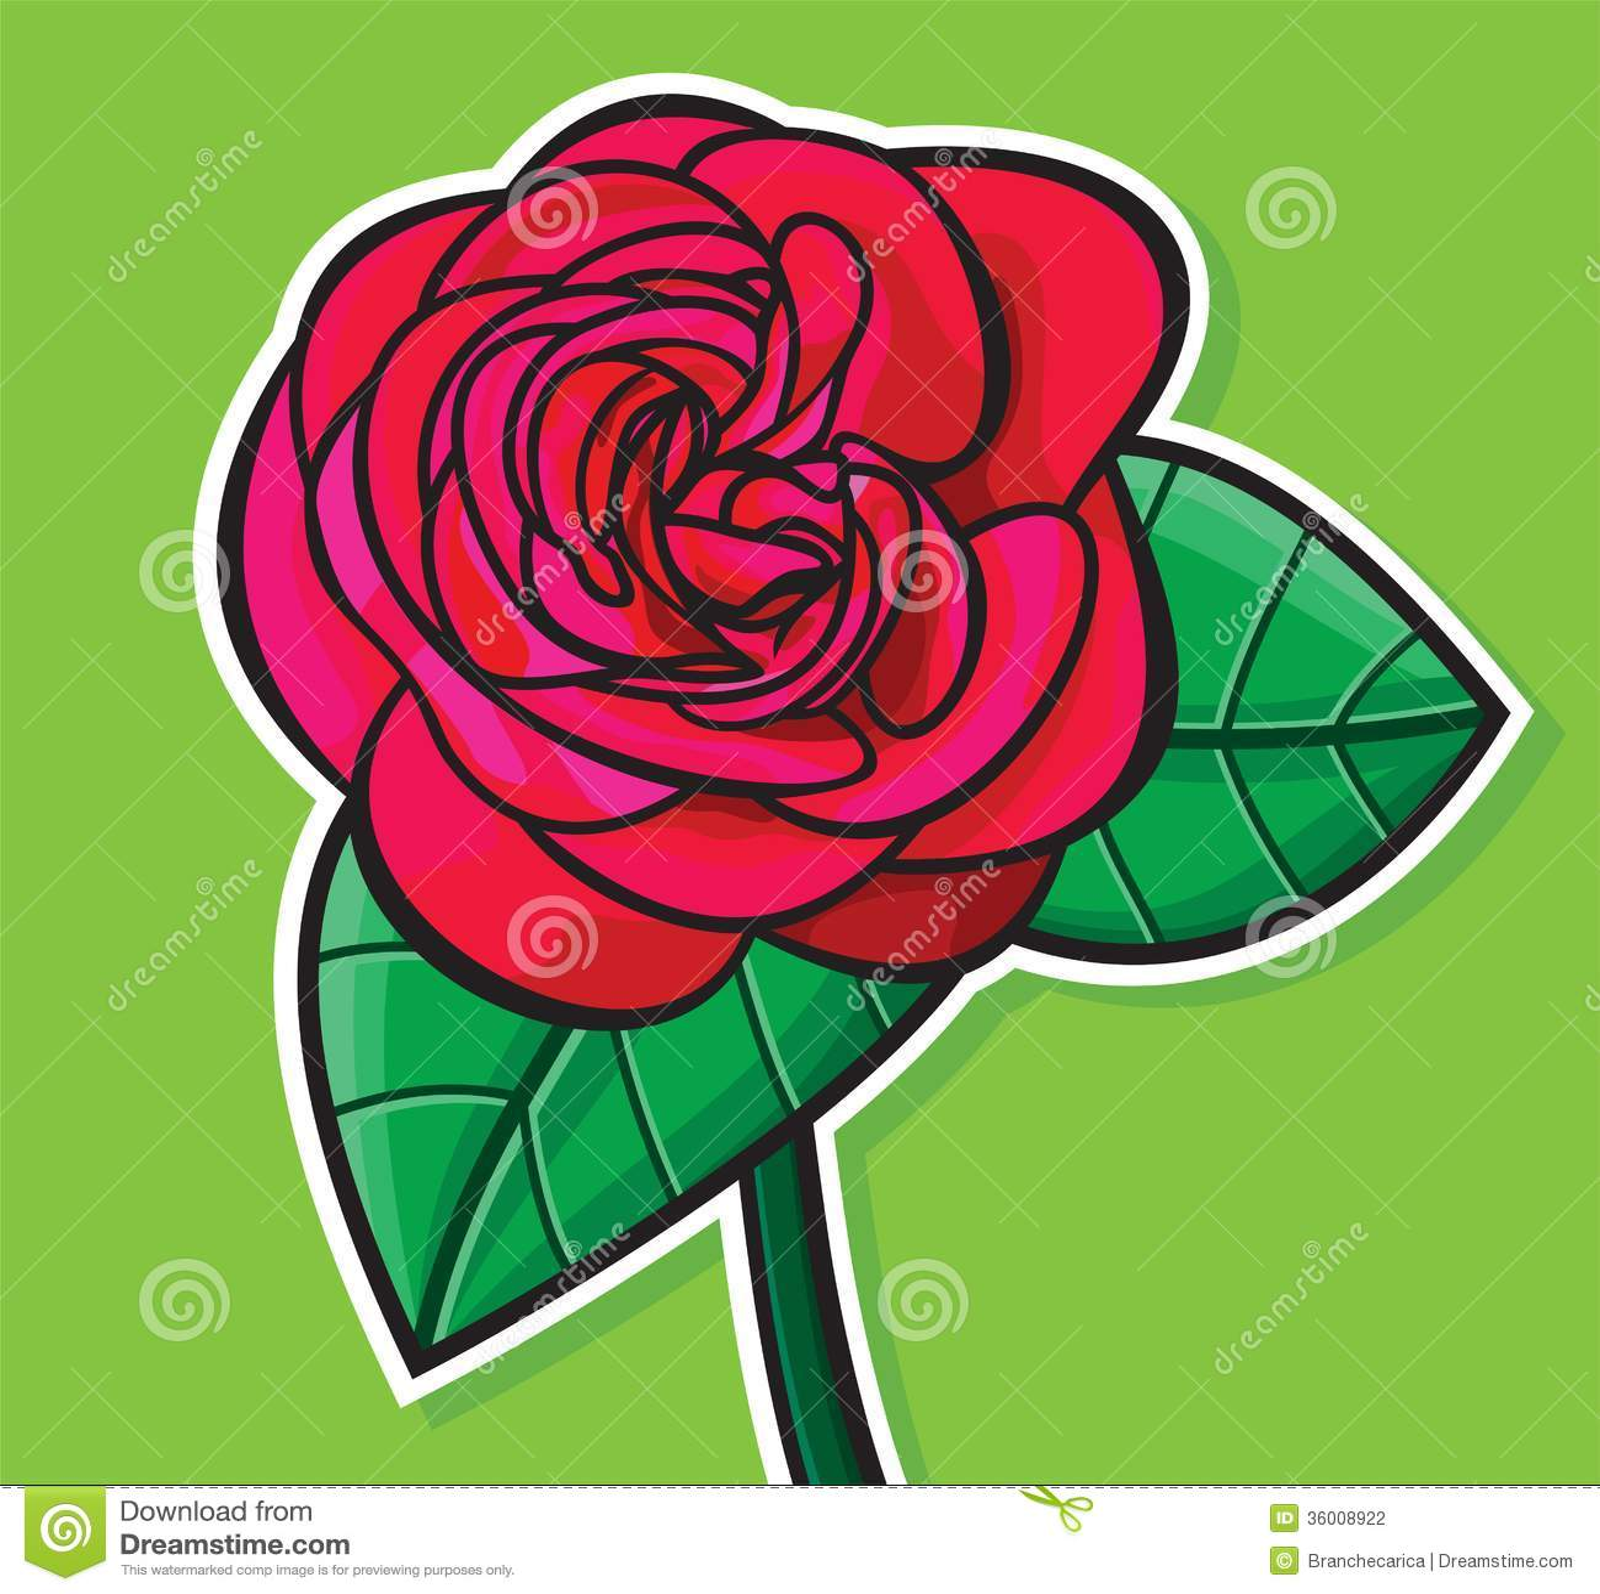 Rose Illustration Vector